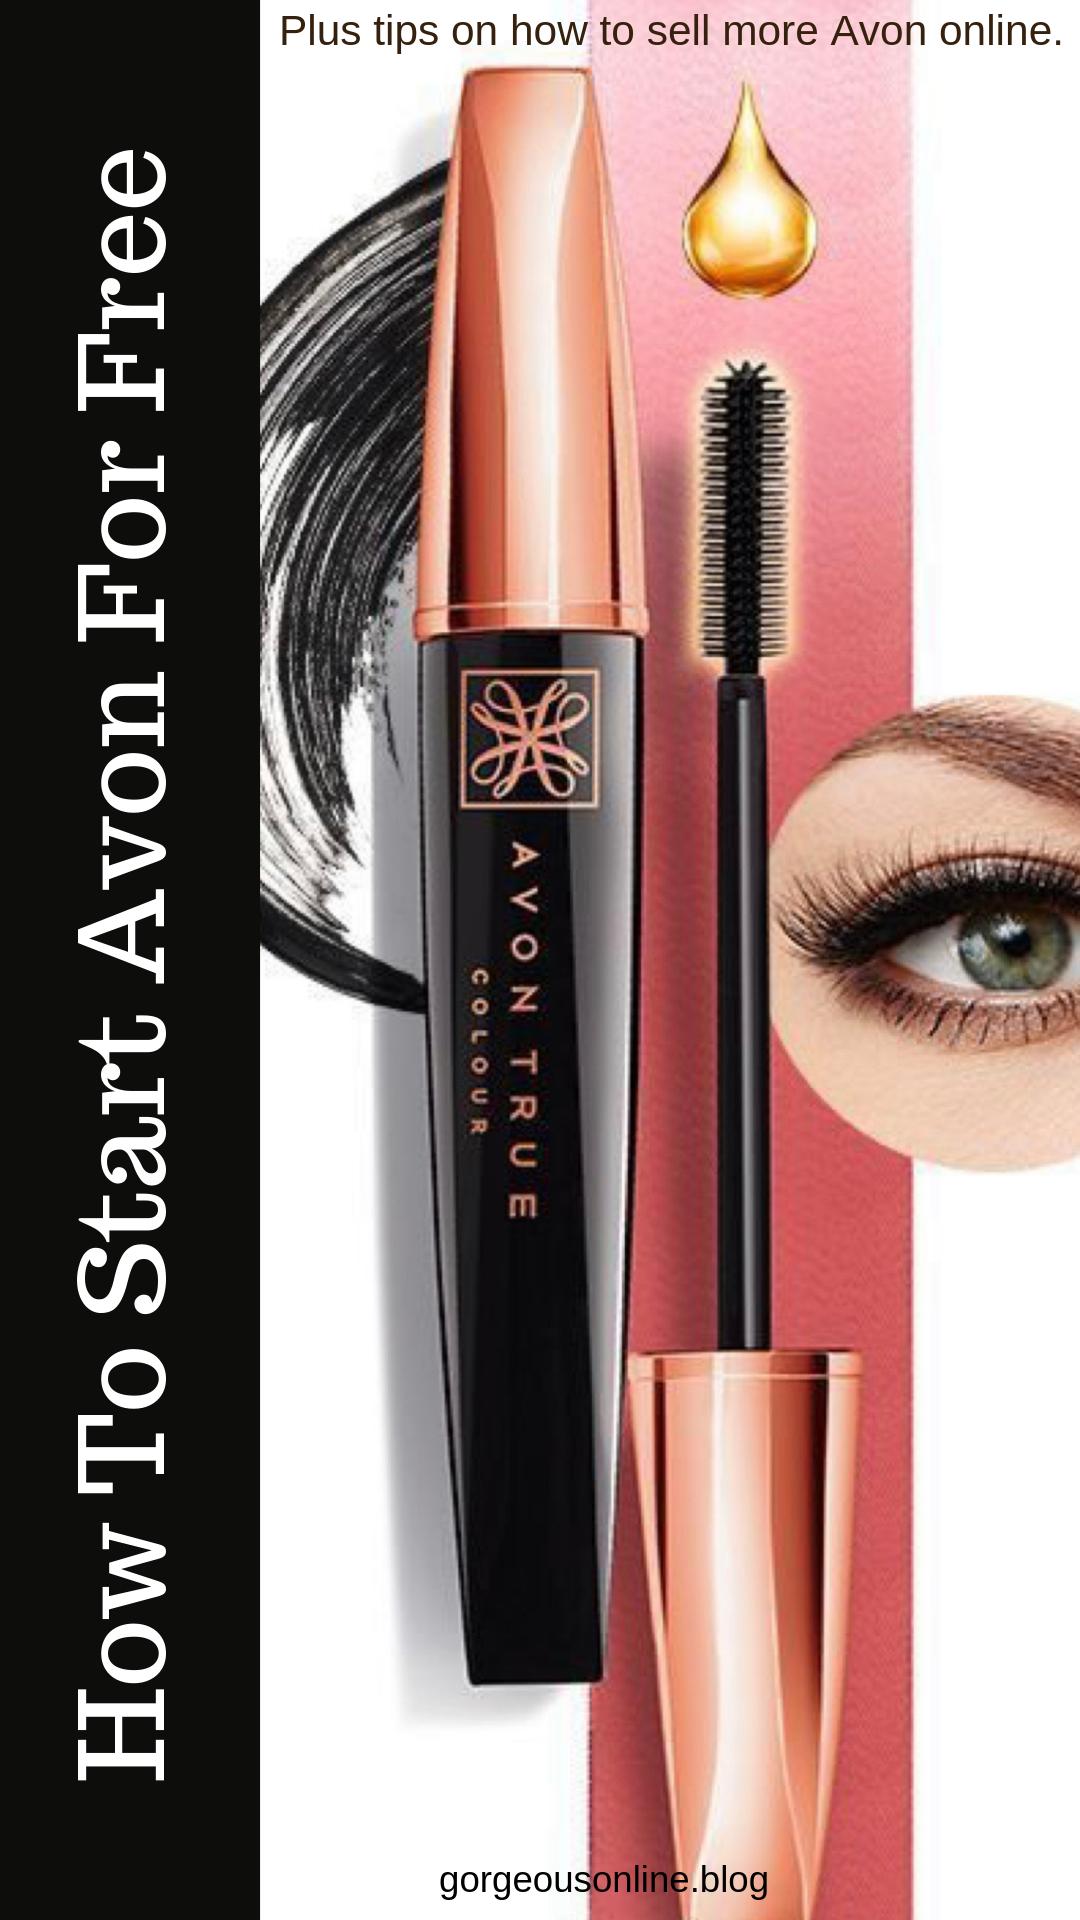 7 Ways To Start Avon For Free Sell makeup online, Avon